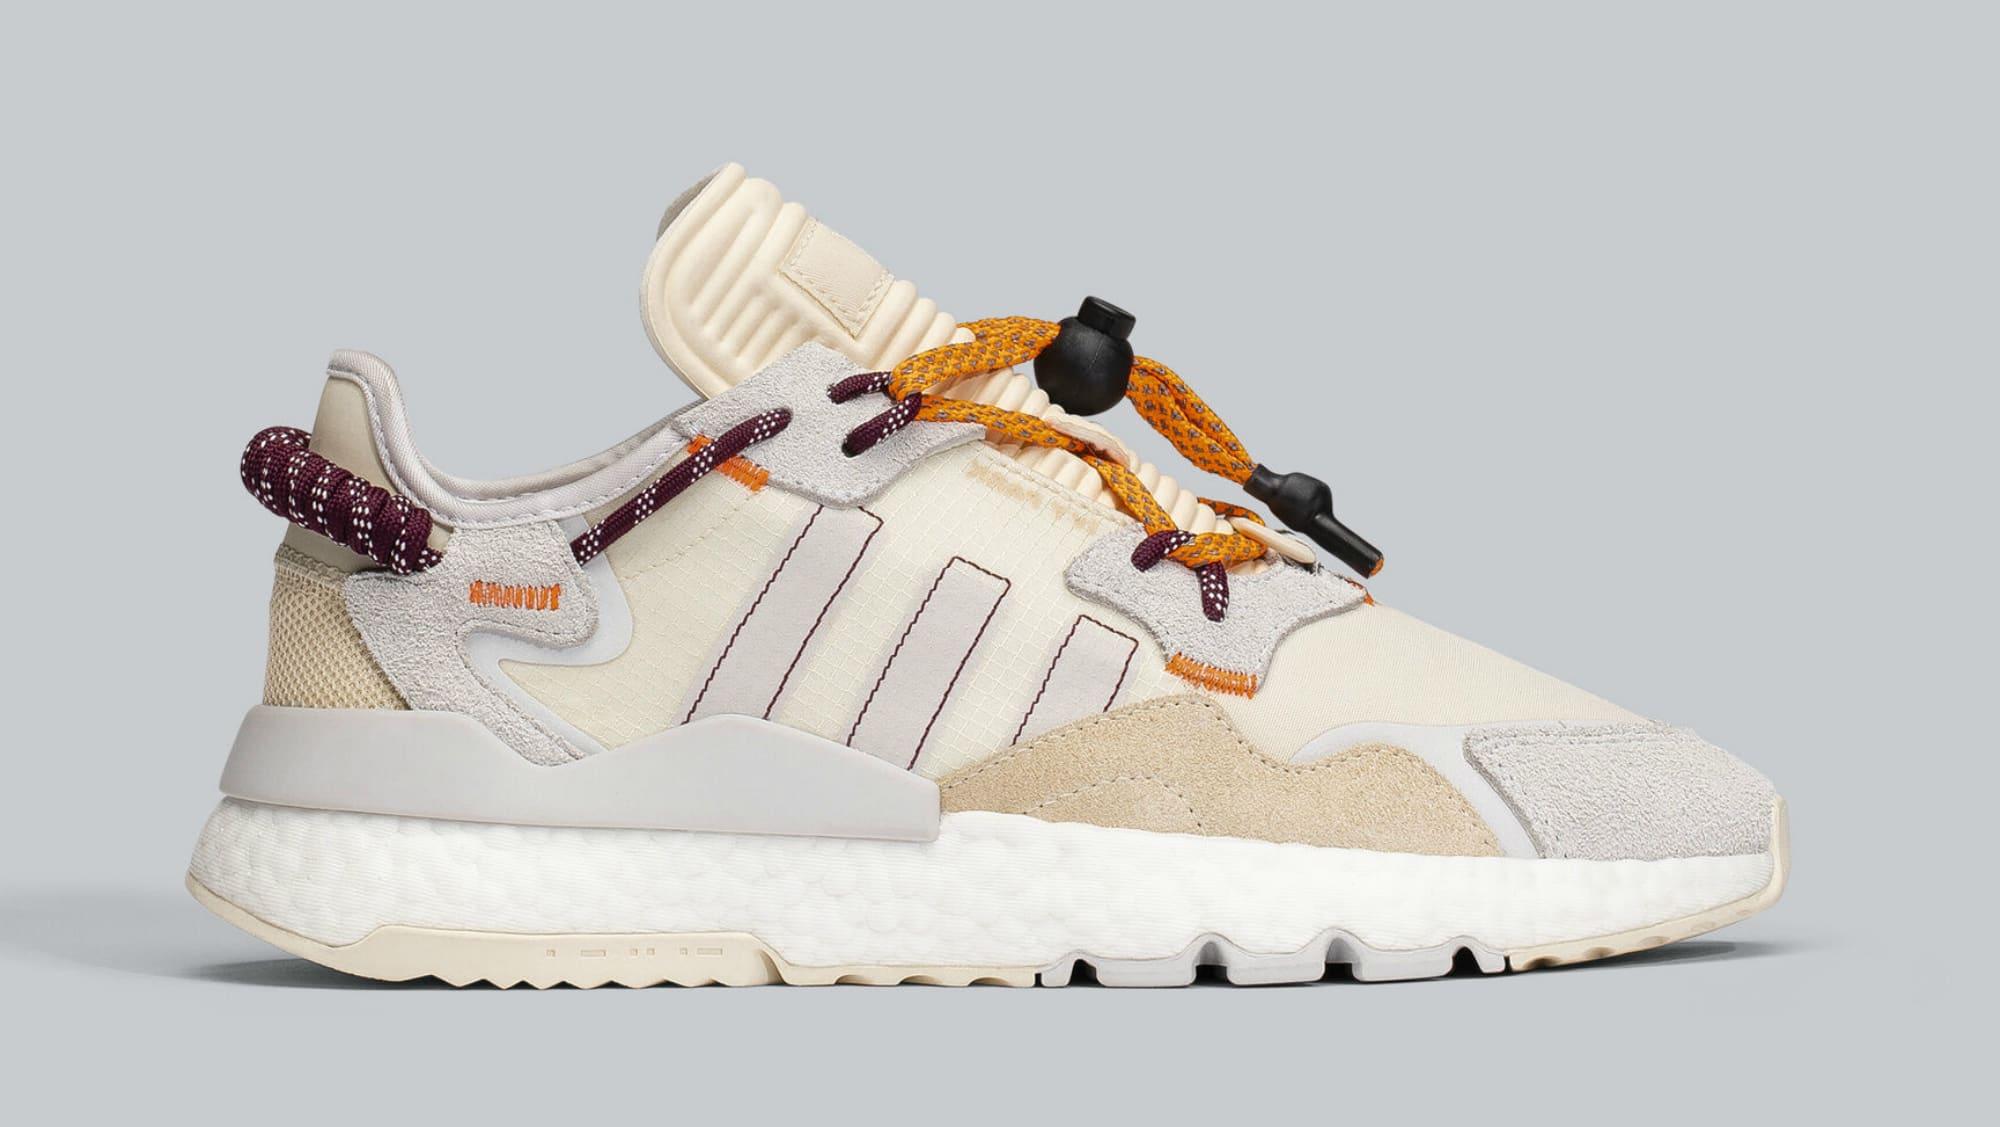 Sneaker Release Guide 1 14 20 Ivy Park X Adidas Air Jordan